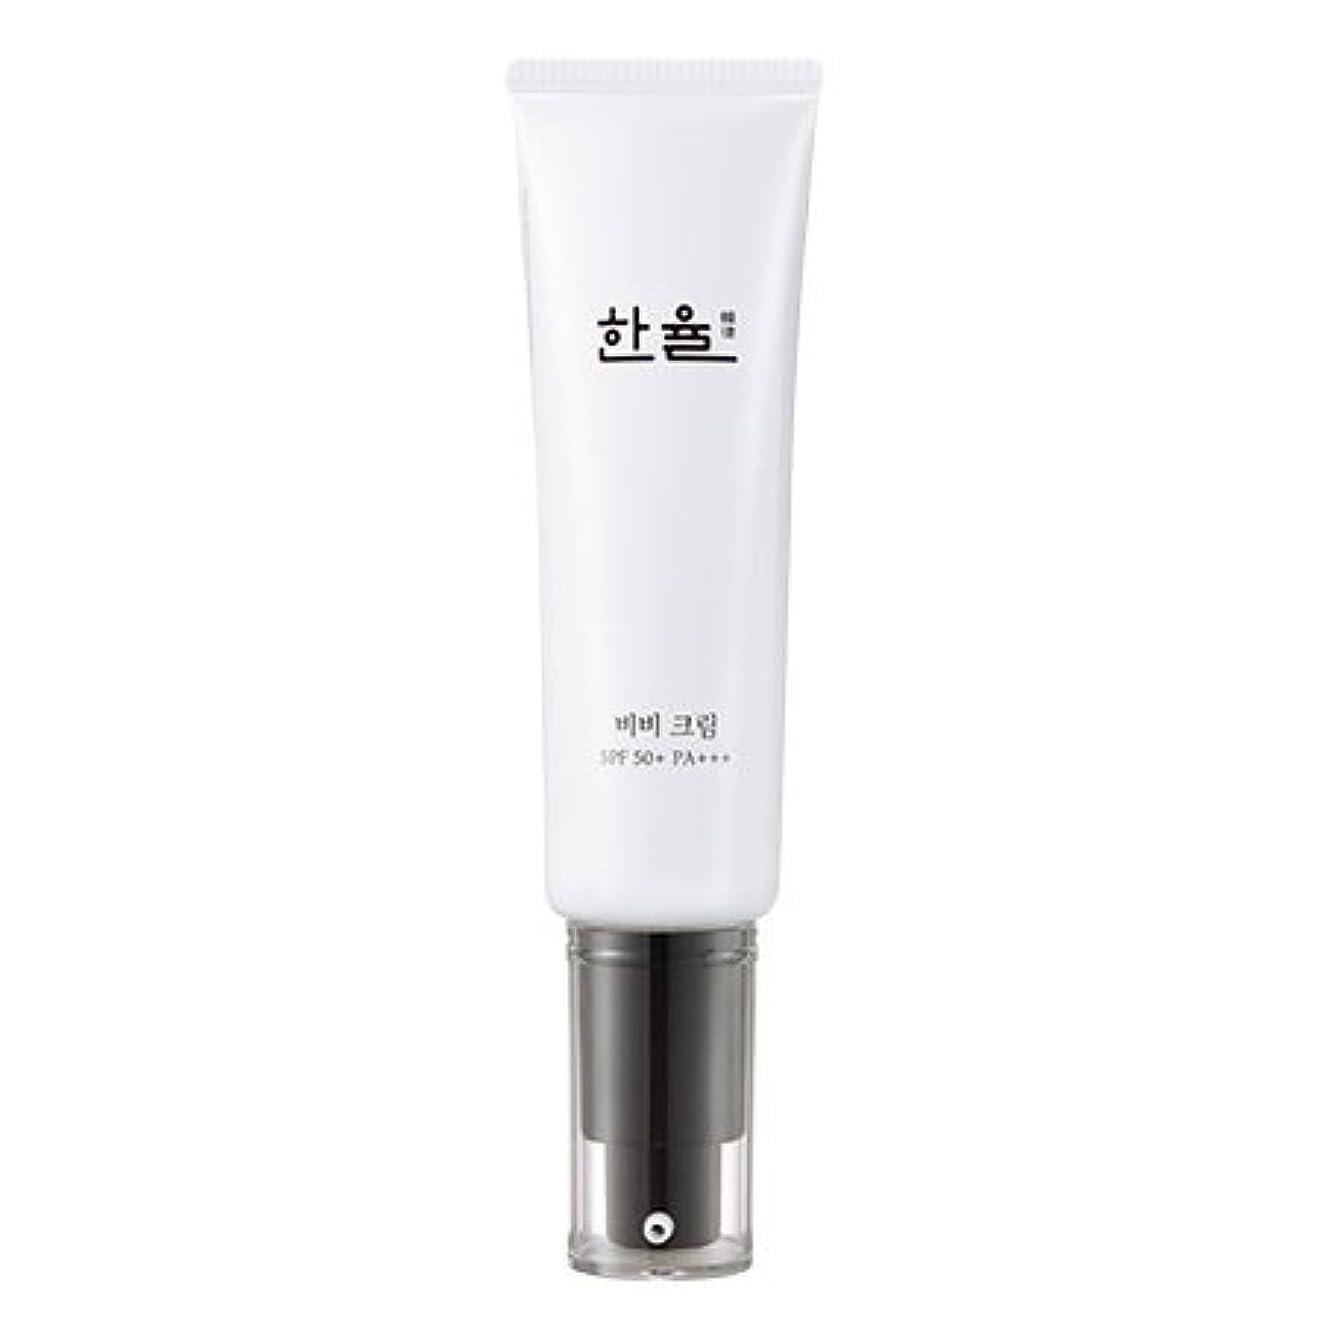 HANYUL BB Cream 40ml/ハンユル BBクリーム 40ml (#2 Natural Beige) [並行輸入品]